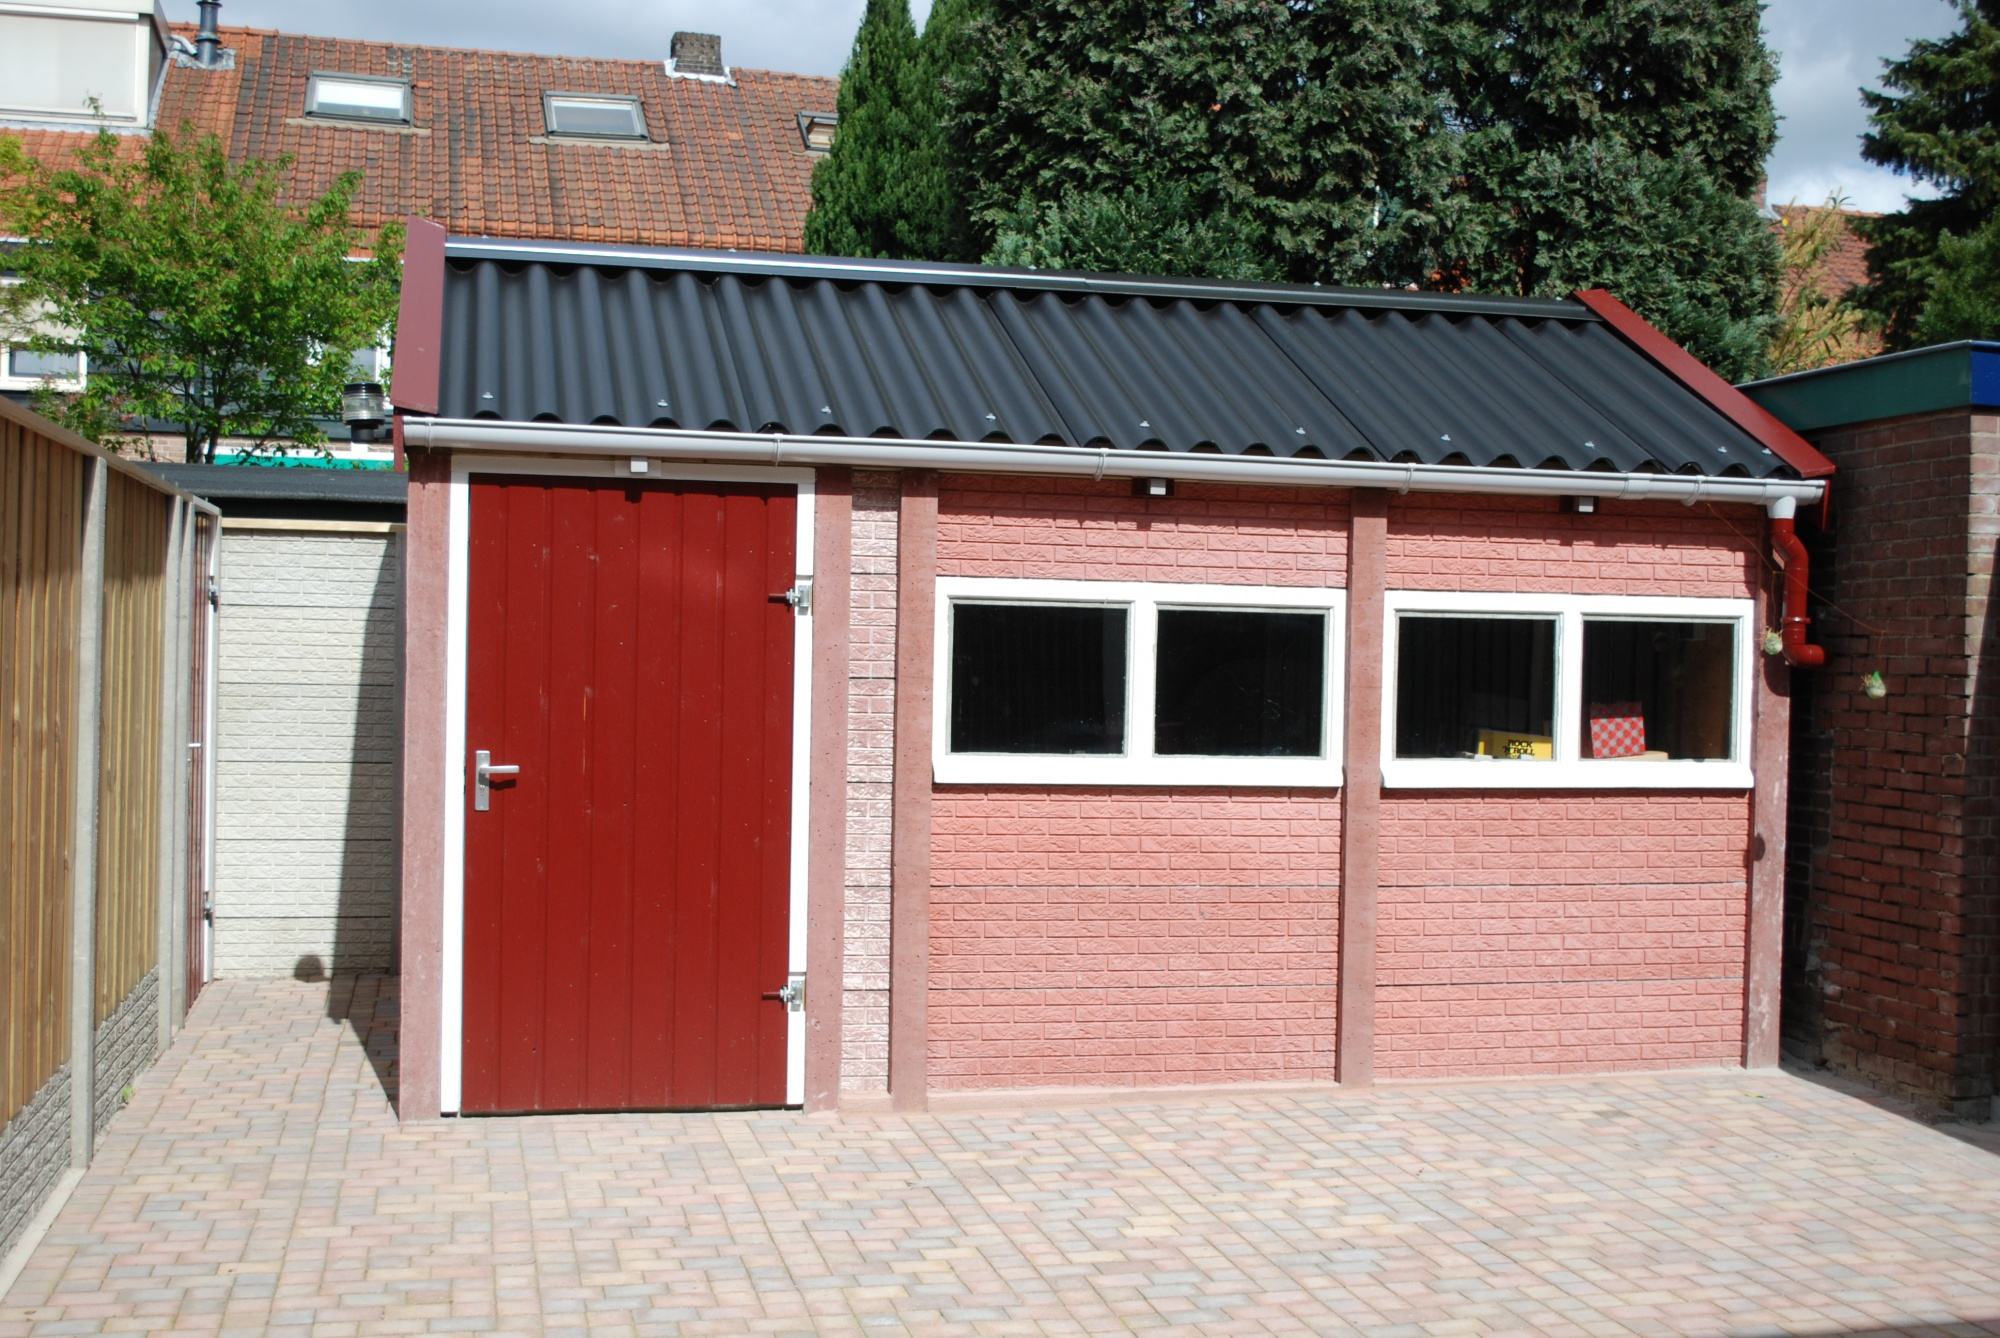 Beton Garage Prefab : Betonnen garage enkelzijdig beton systeembouw handvorm steenmotief